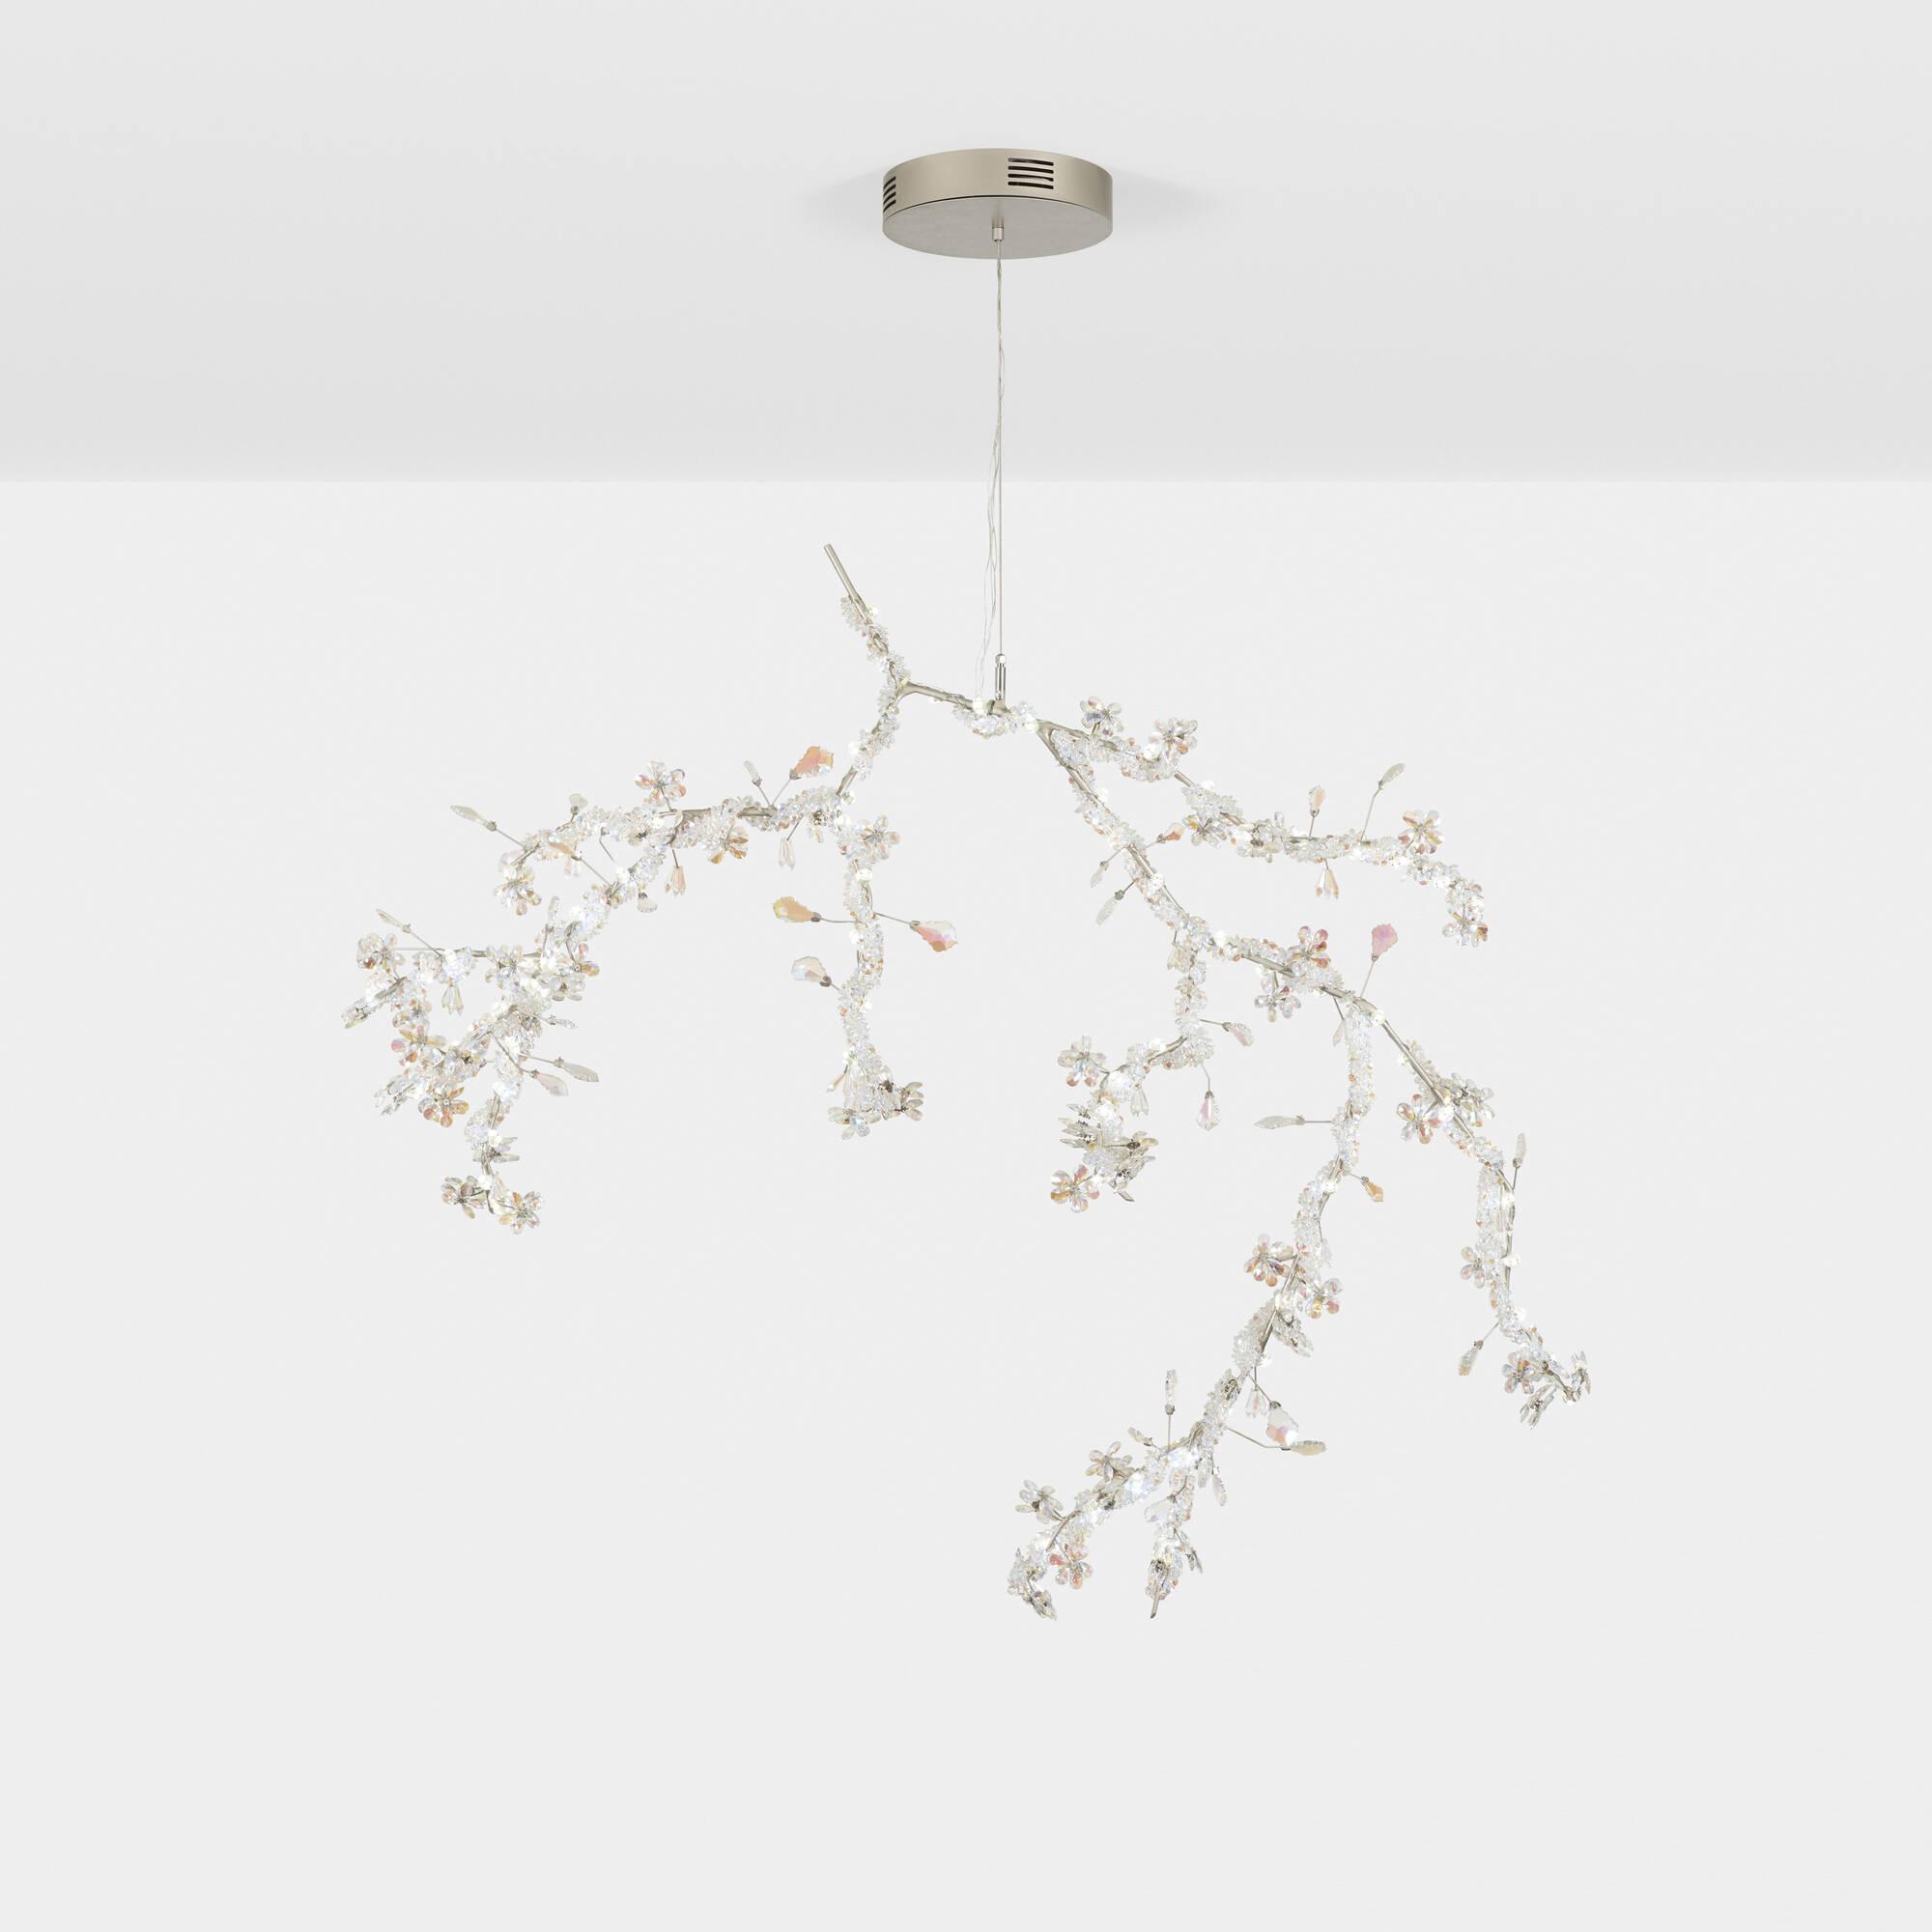 453 Tord Boontje Blossom Chandelier 2 Of 3